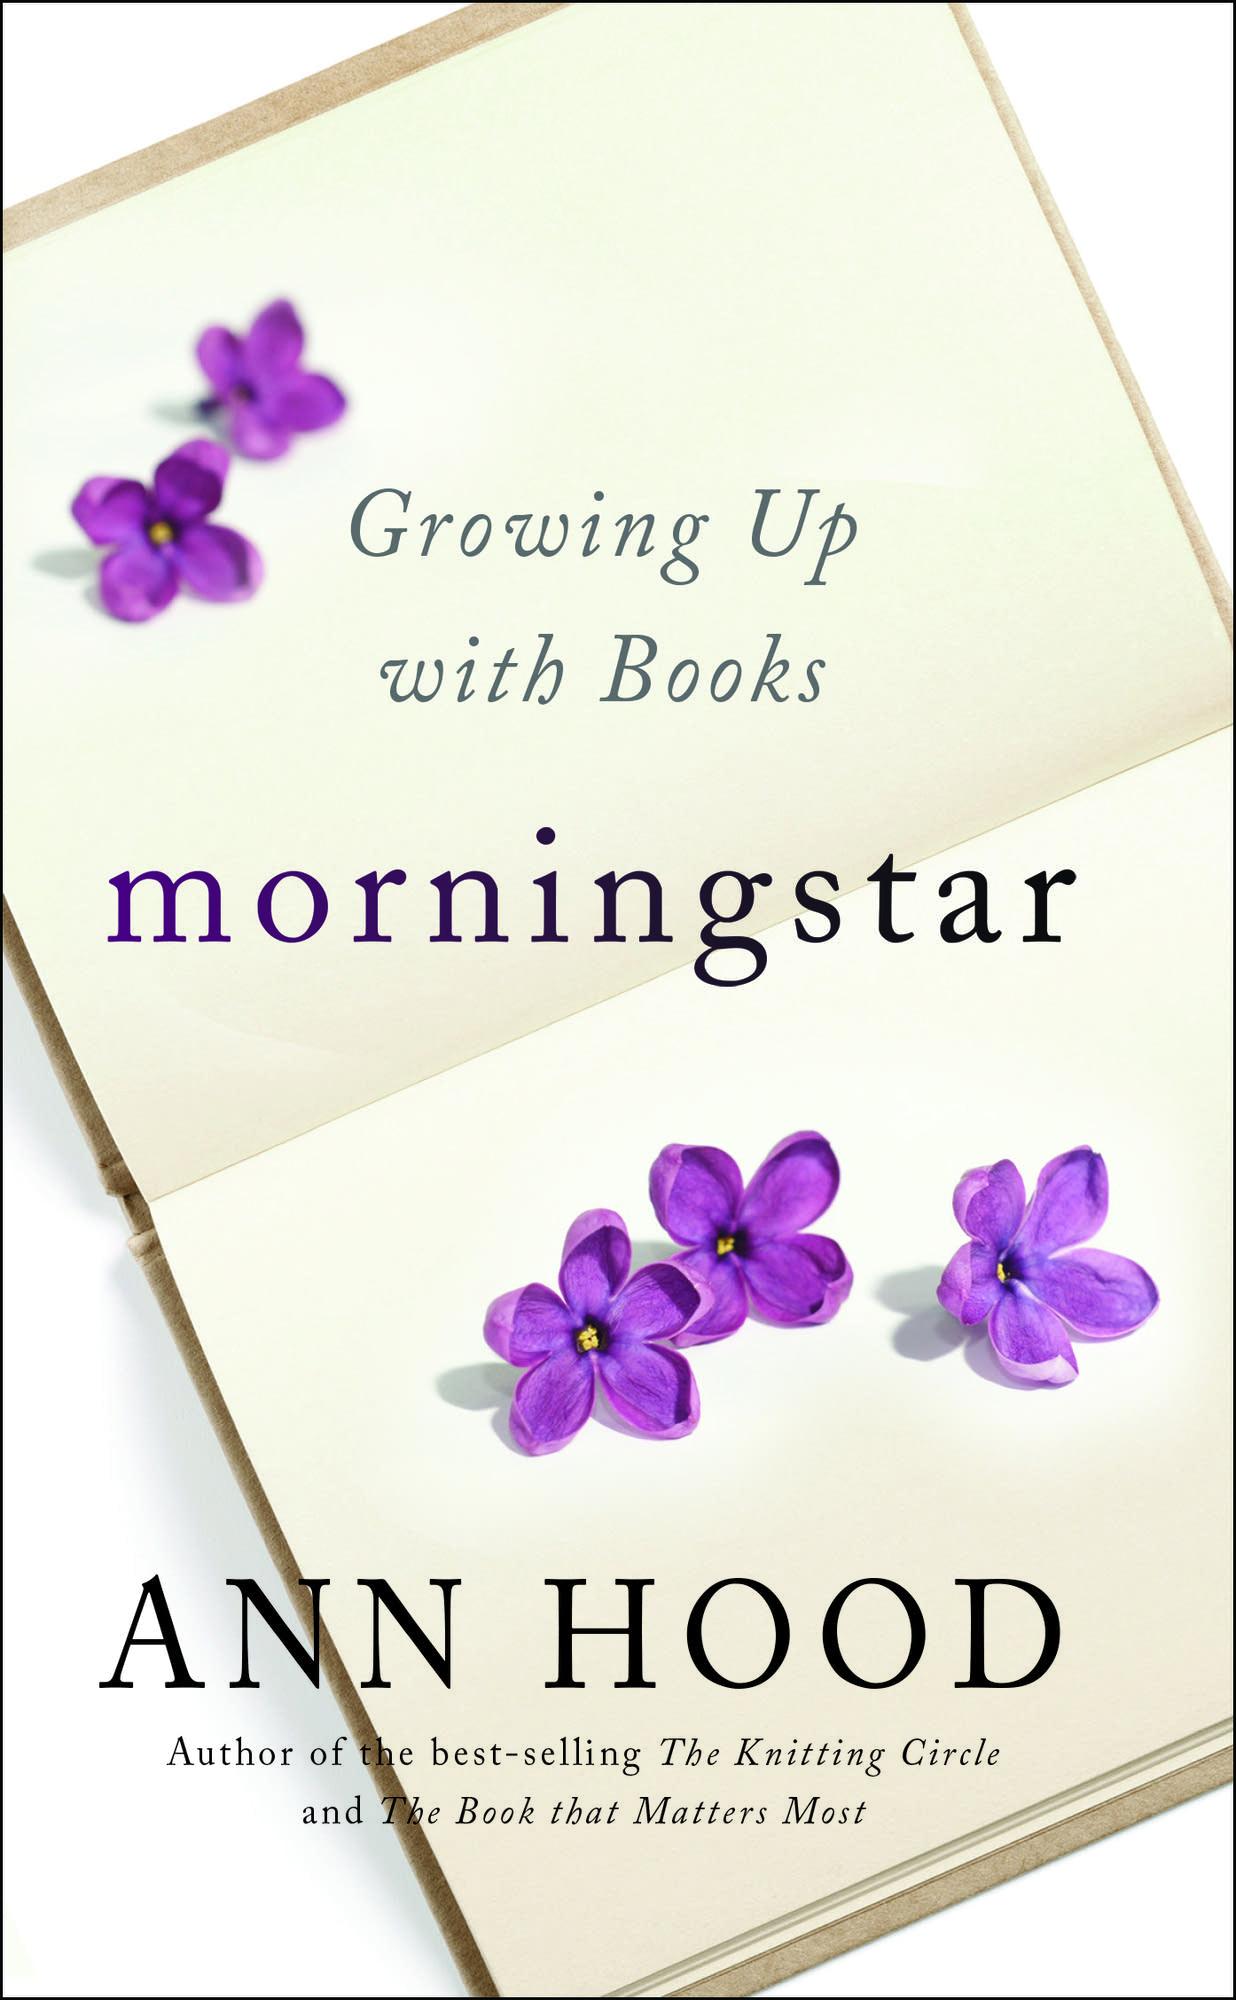 'Morningstar' by Ann Hood